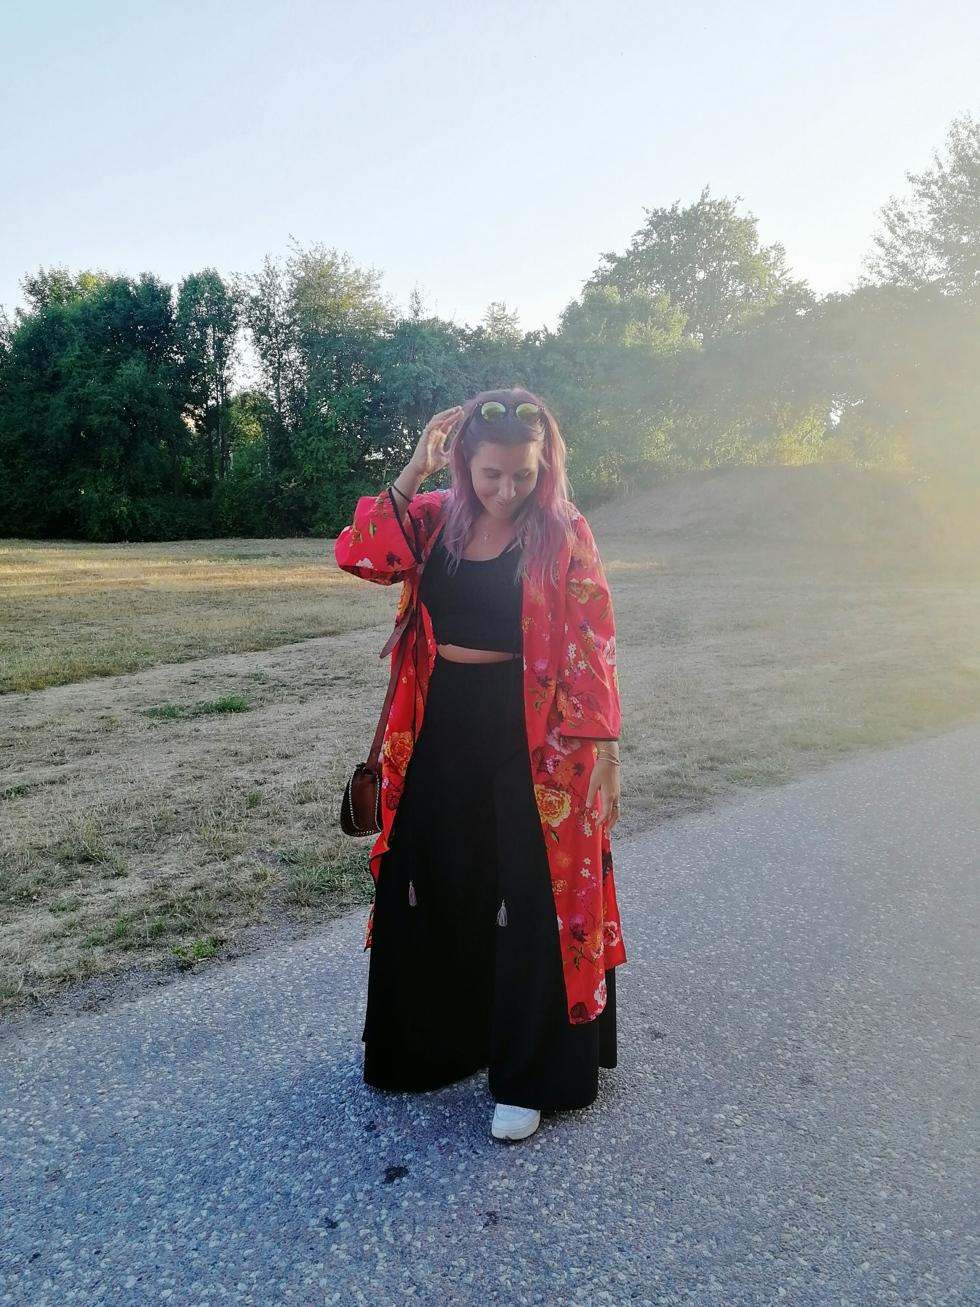 3e9424aa Kläder - Sophia Anderberg - Metro Mode - Sida 4